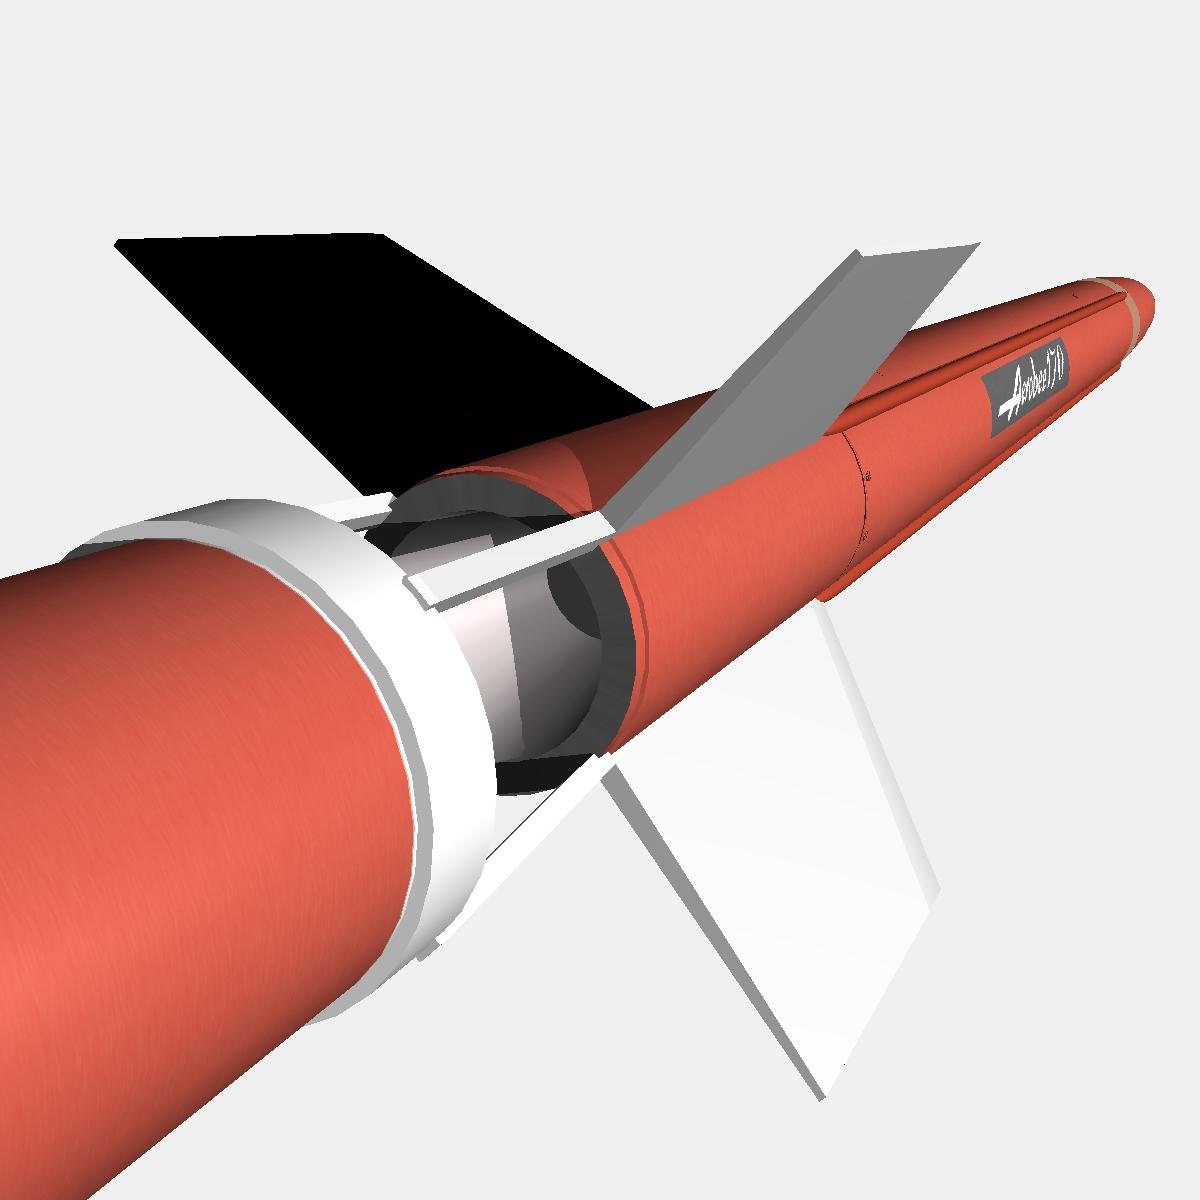 aerobee 170 rocket 3d model 3ds dxf fbx blend cob dae x  obj 166040